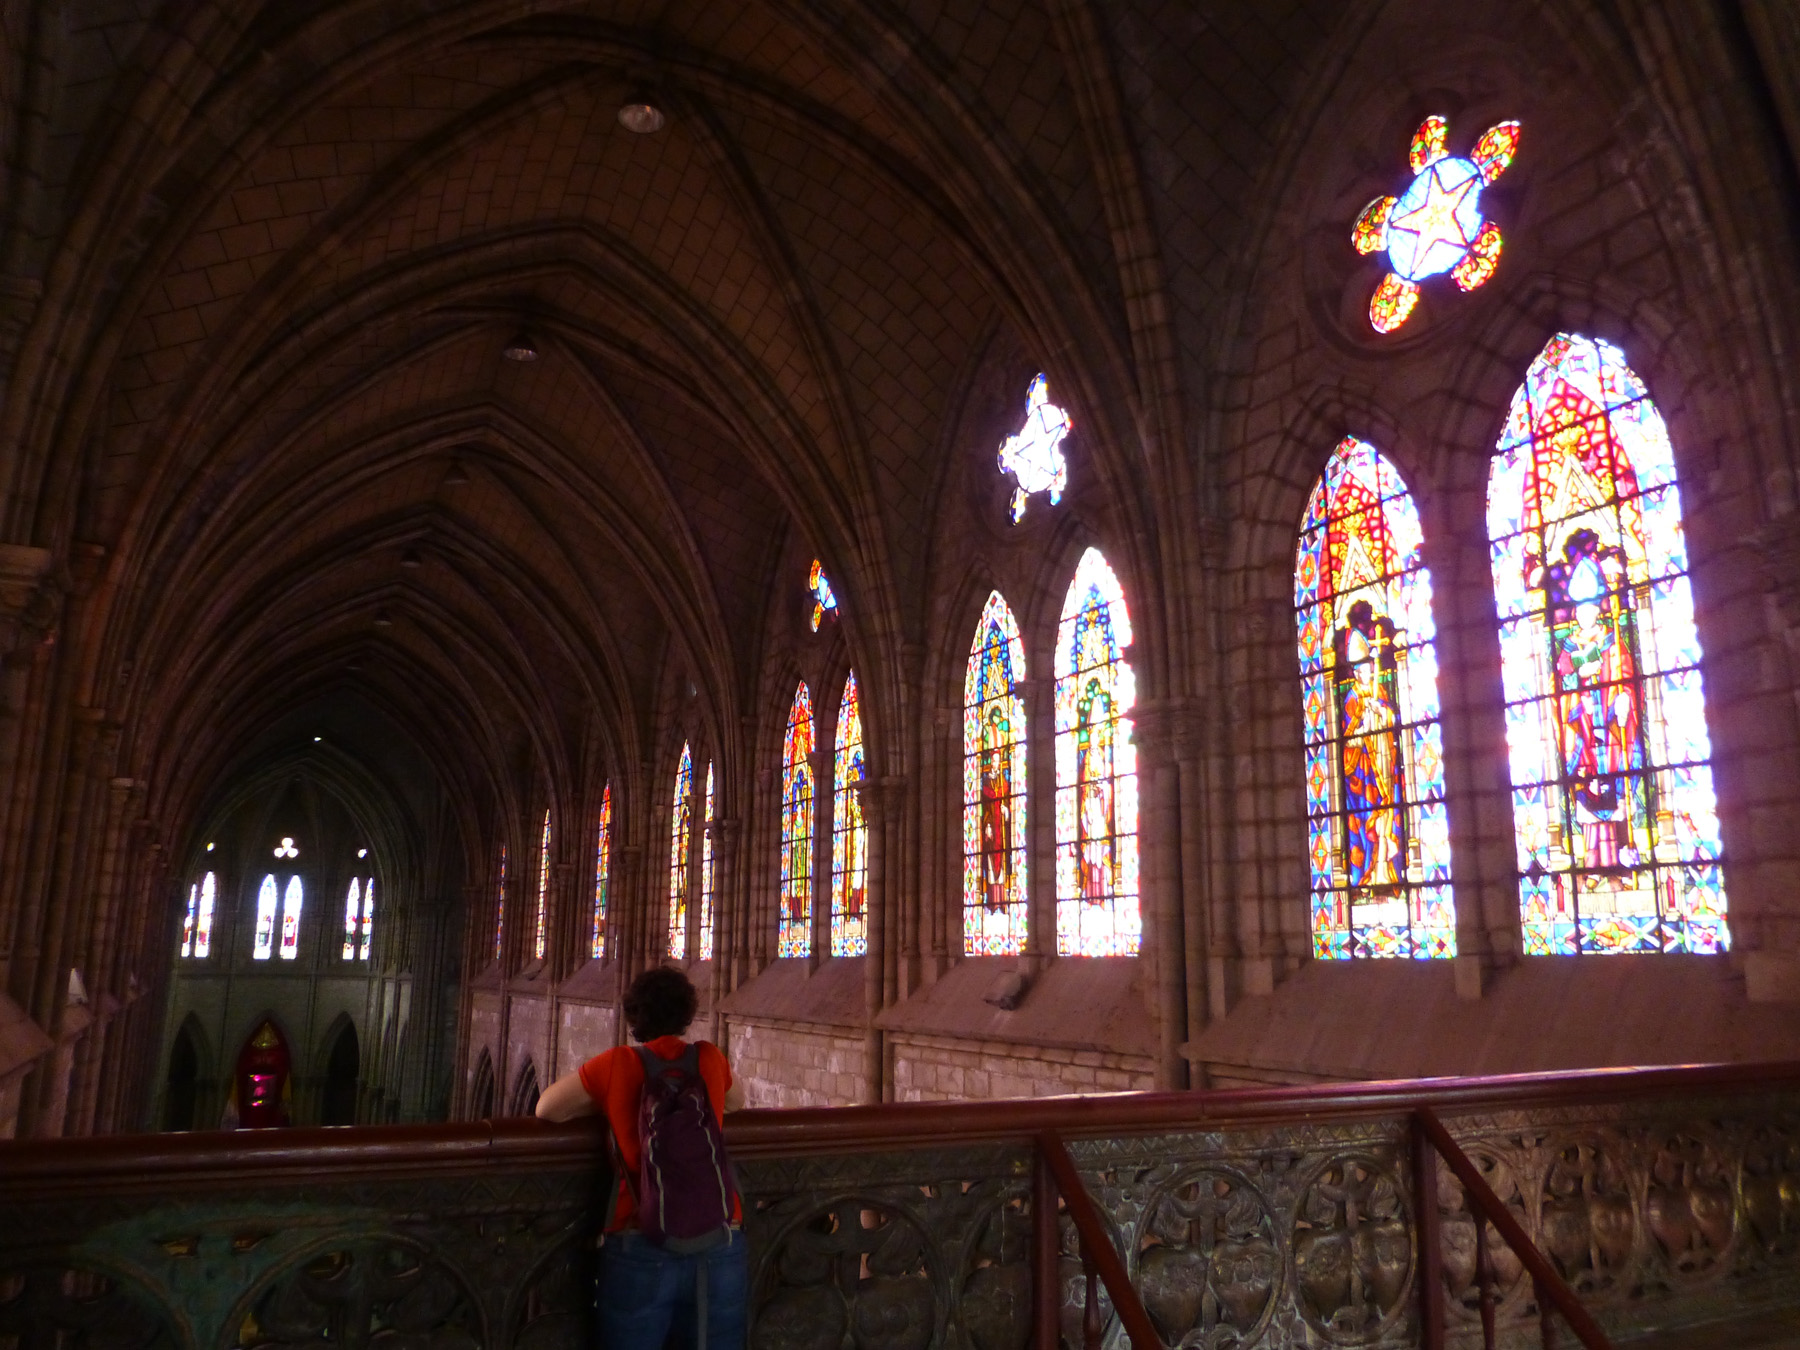 Interior of The Basílica Sanctuary